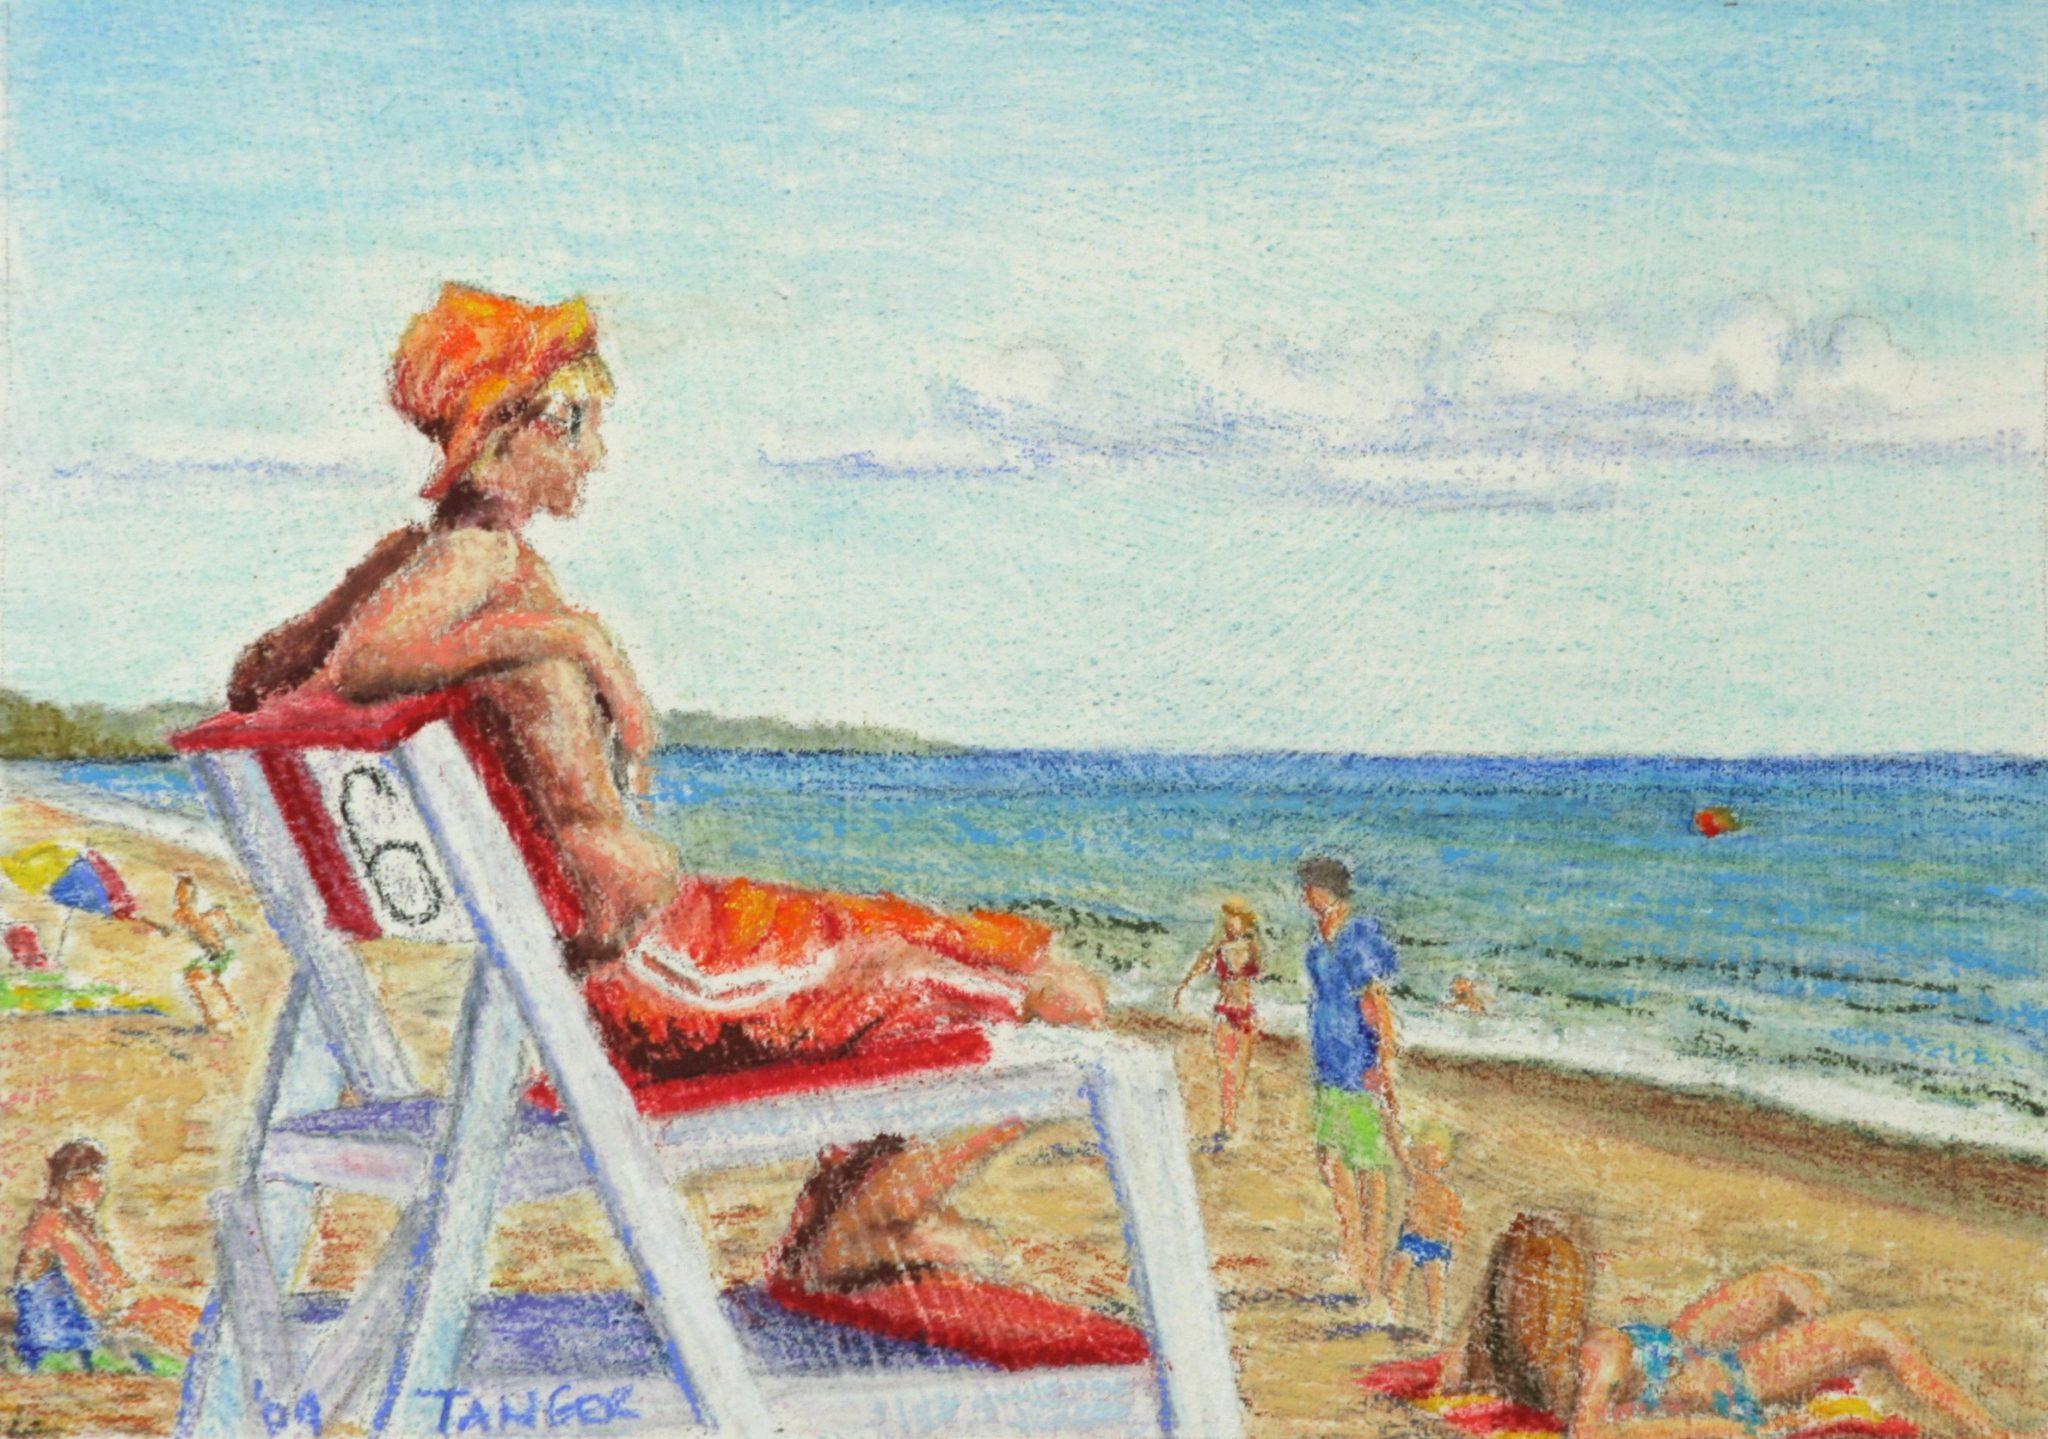 lifeguard #6 at Misquamicut beach